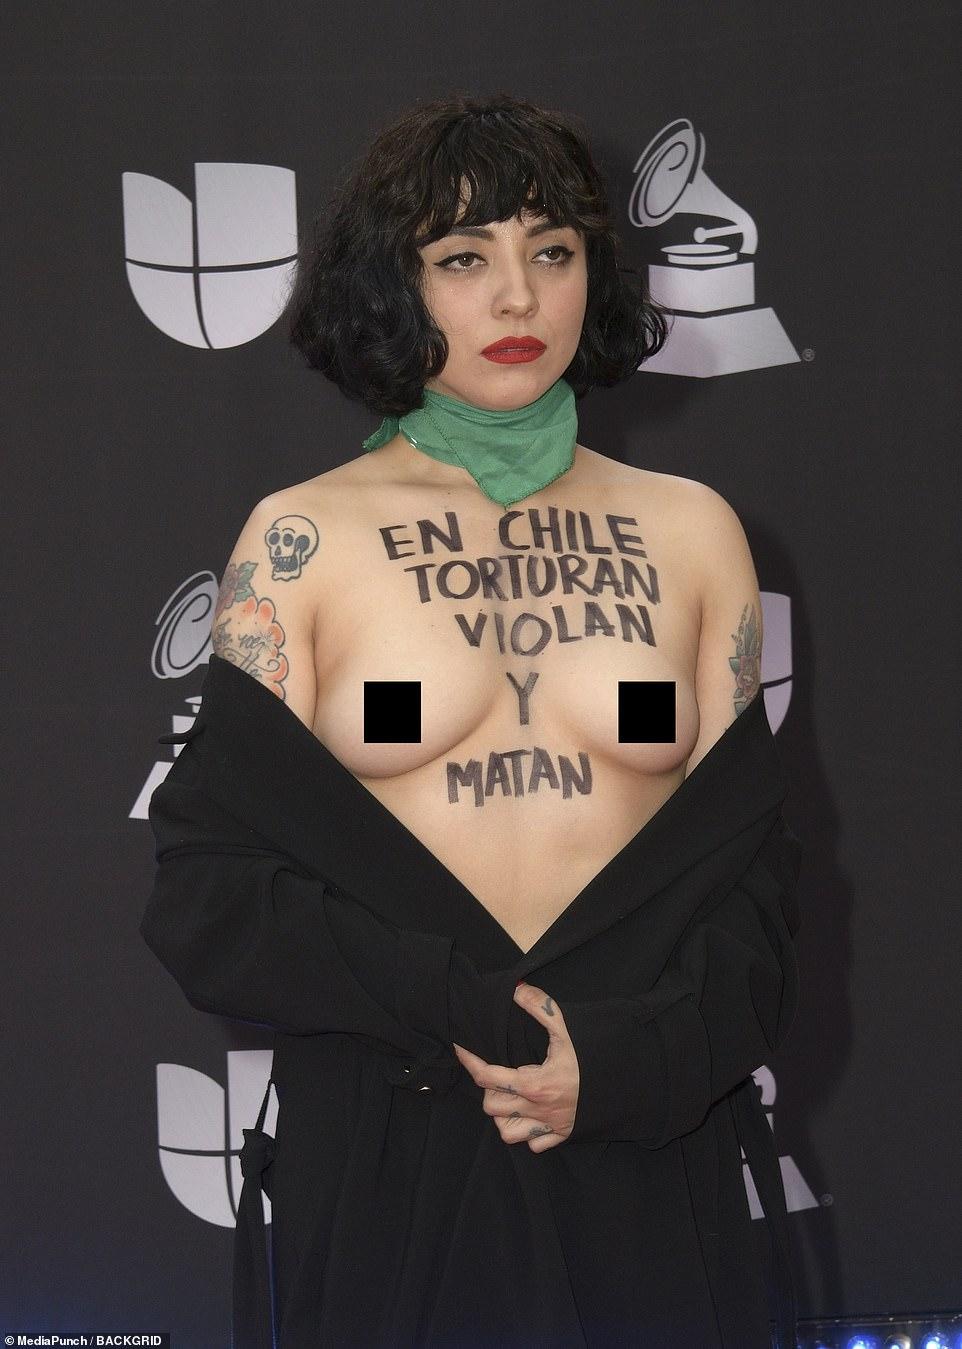 My Body, My Protest: After MonLaferte